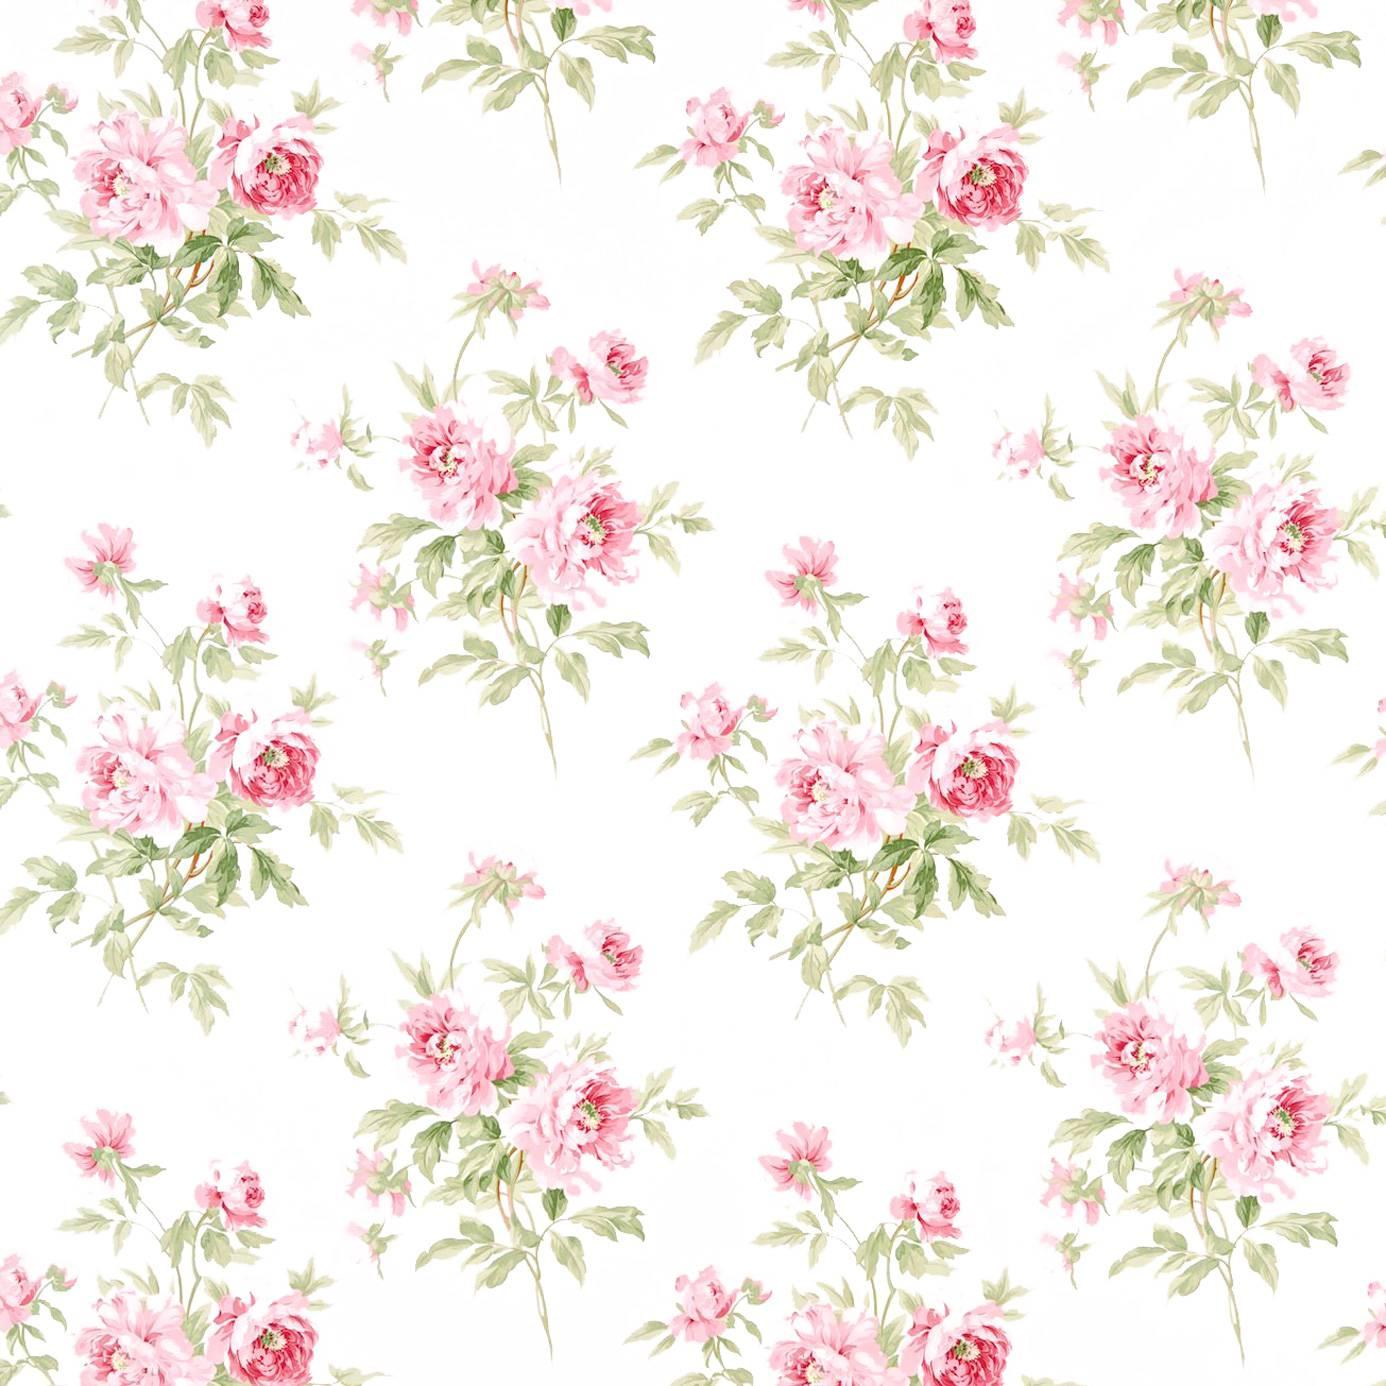 Adele Fabric Rose Cream Dcavad201 Sanderson Caverley